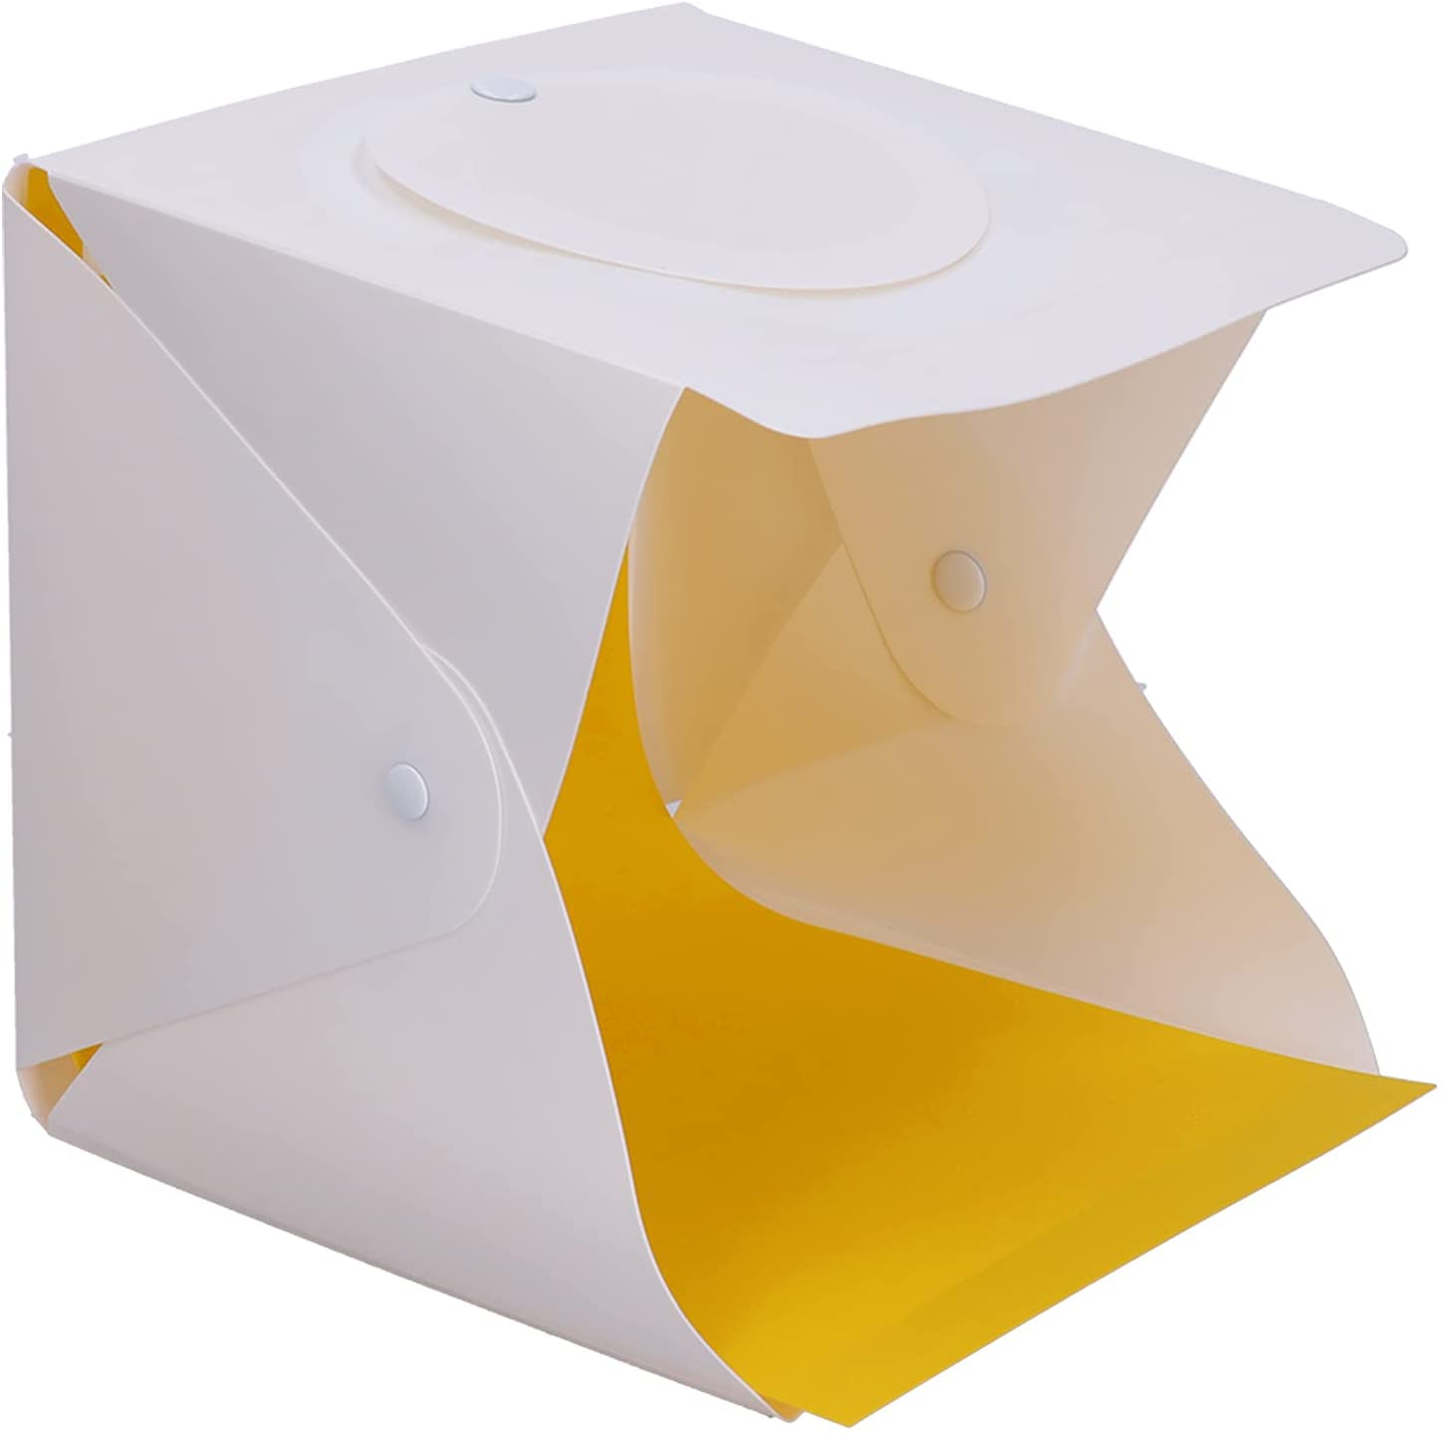 CUTULAMO Inexpensive Mini Led Light Bargain Soft Dissipation Good Box Heat Photogra